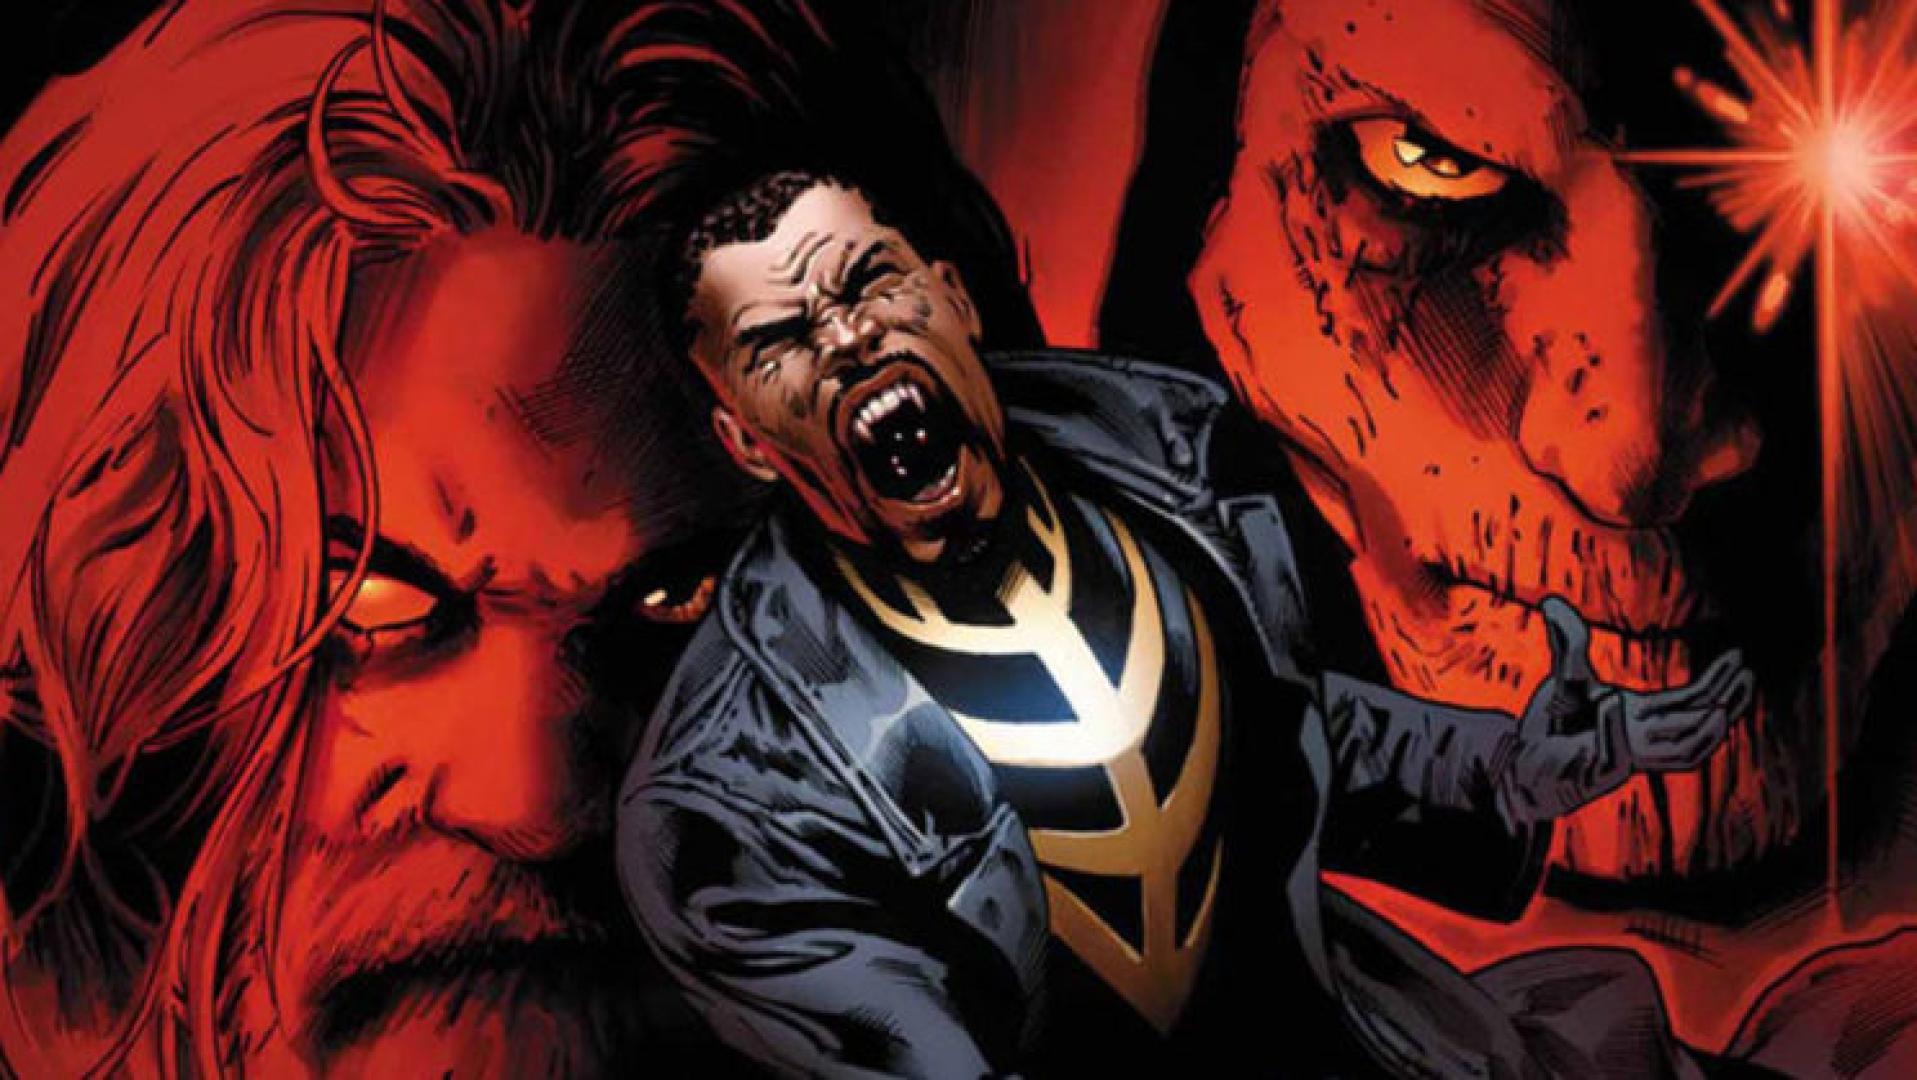 Horrorisztikus Marvel?